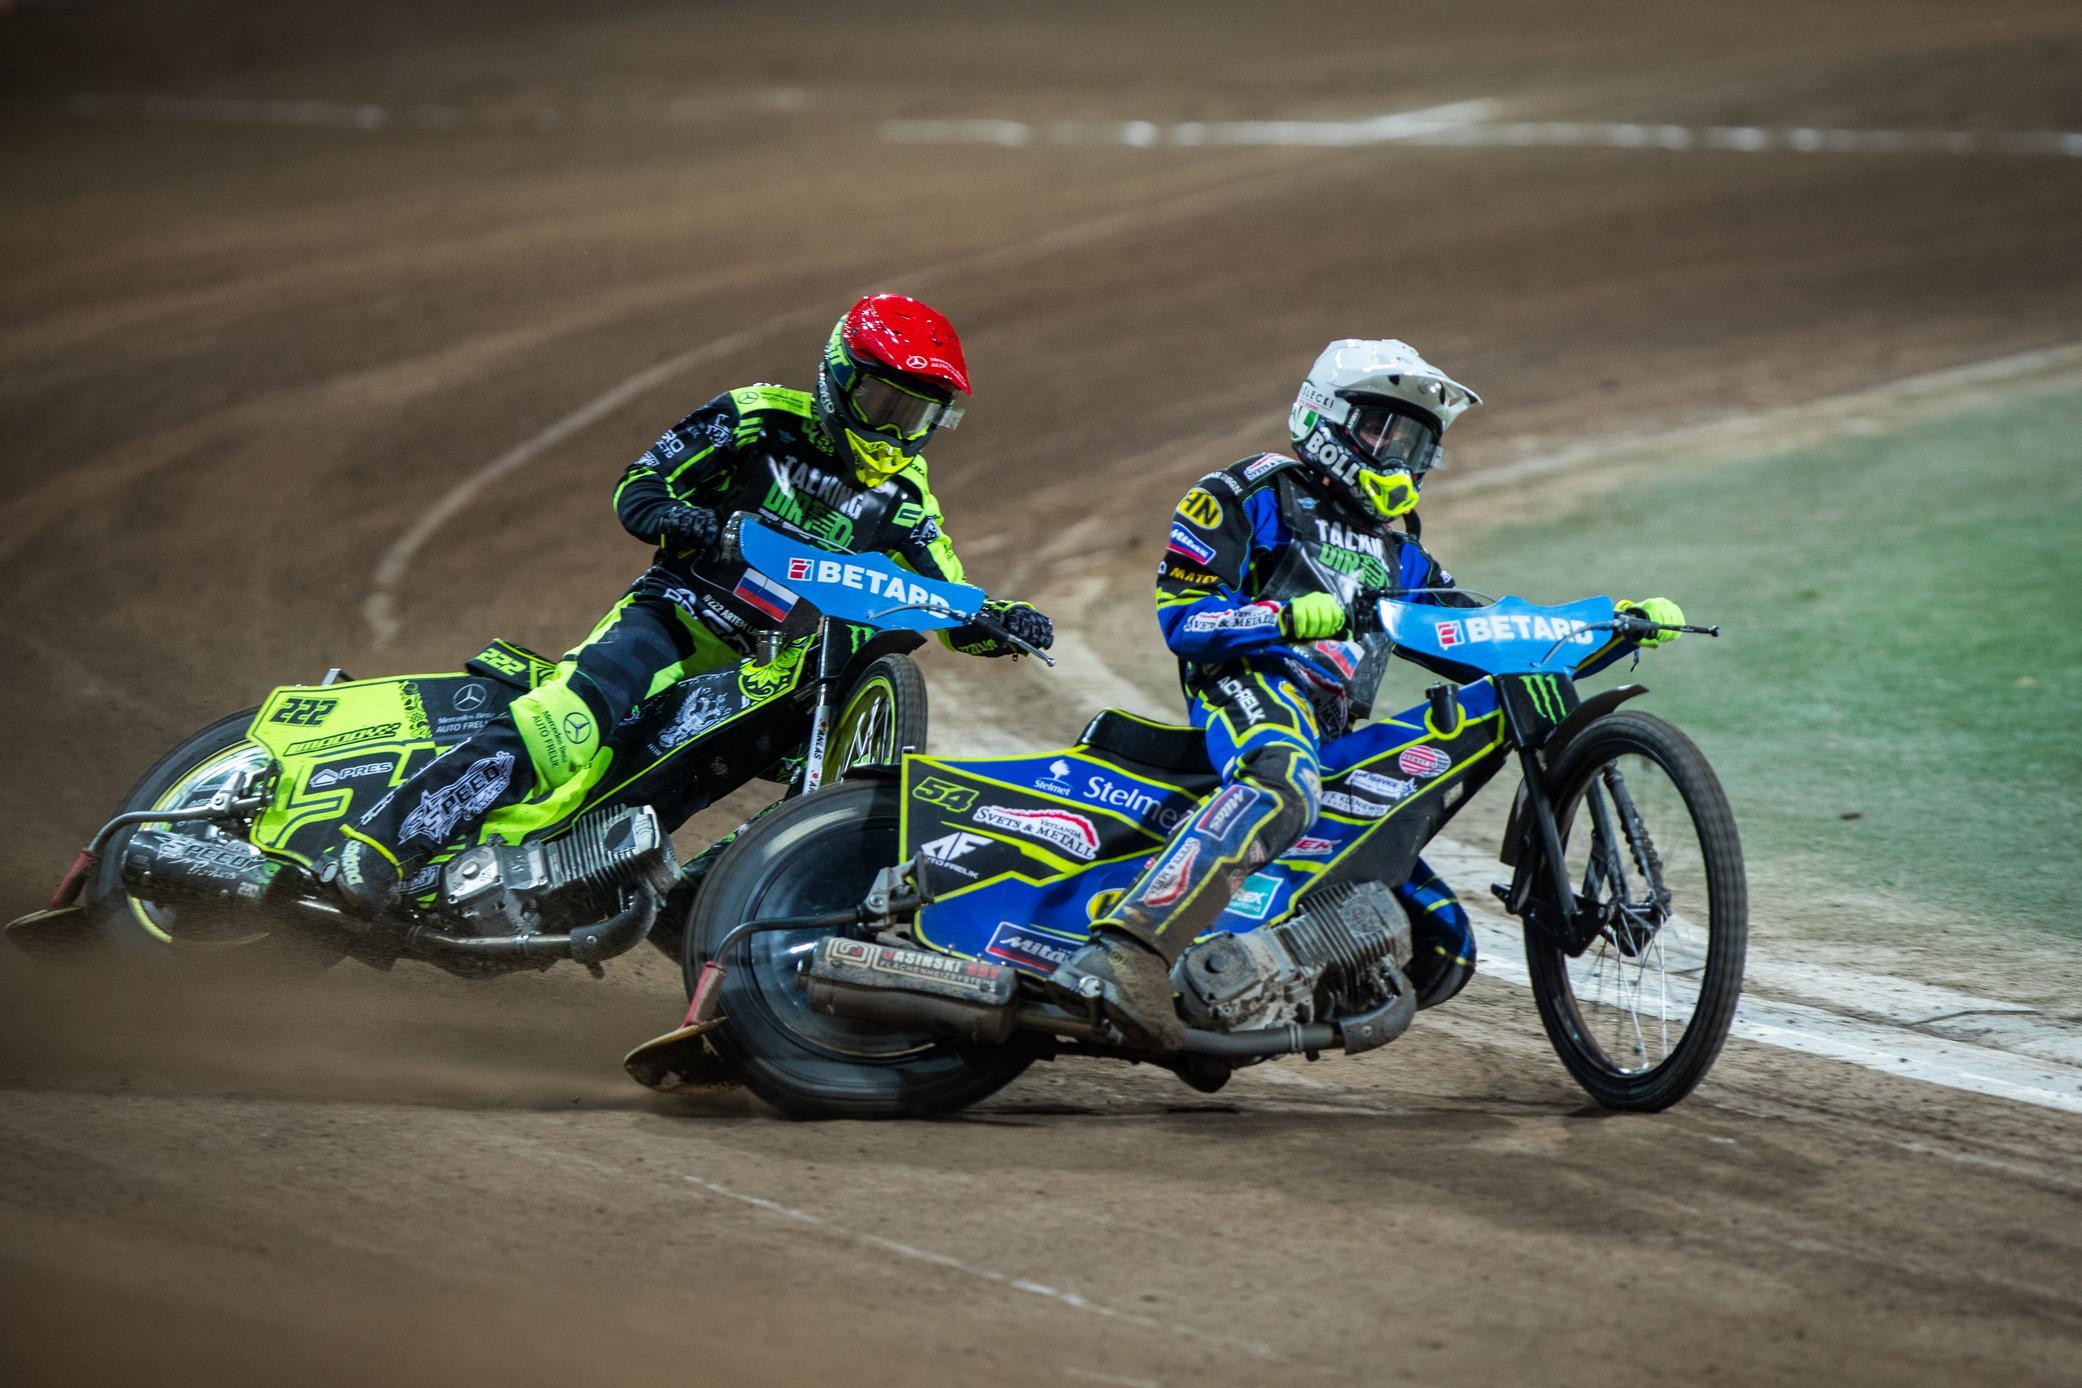 Betard Wrocław FIM Speedway Grand Prix of Poland – round 1